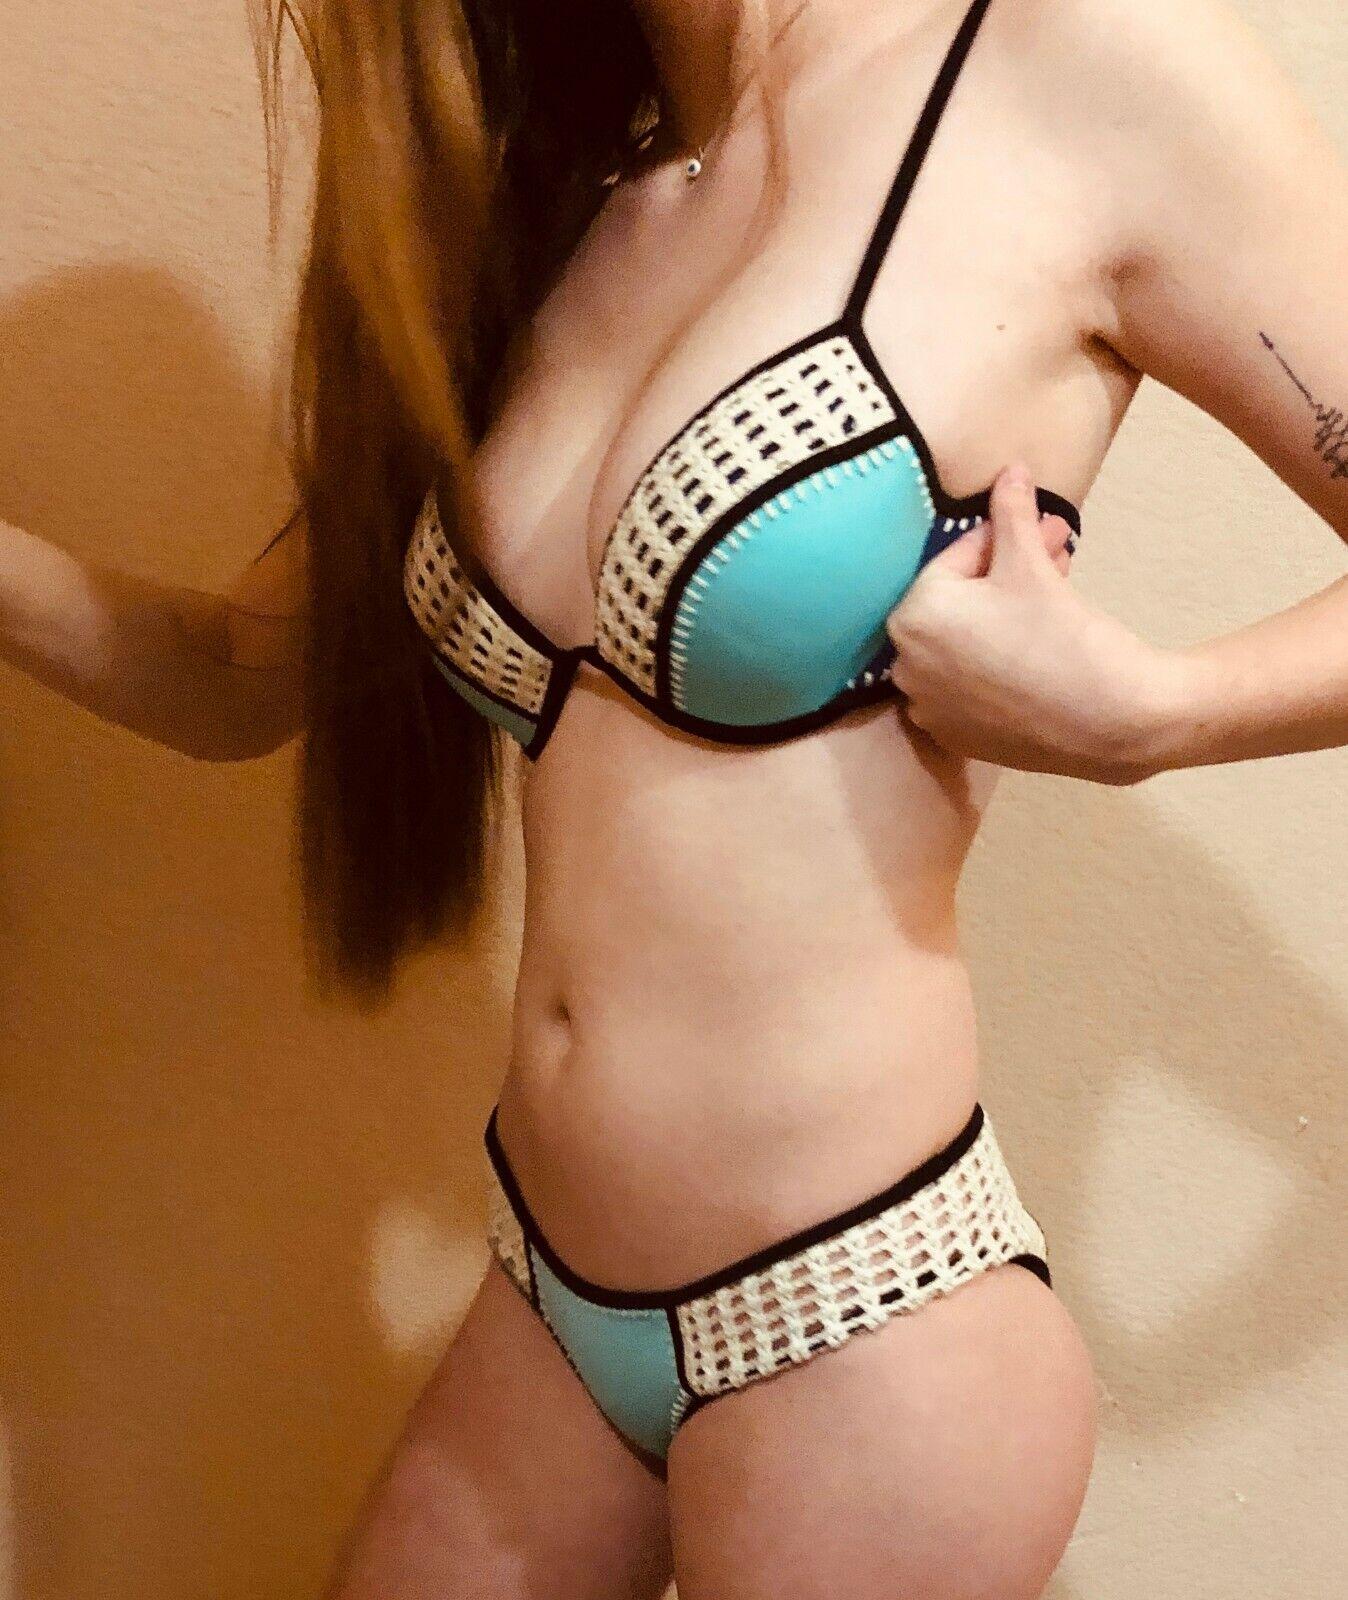 NWT Victoria's Secret Bikini Fabulous Surf Crocheted Aqua Seafoam 34B Swimsuit